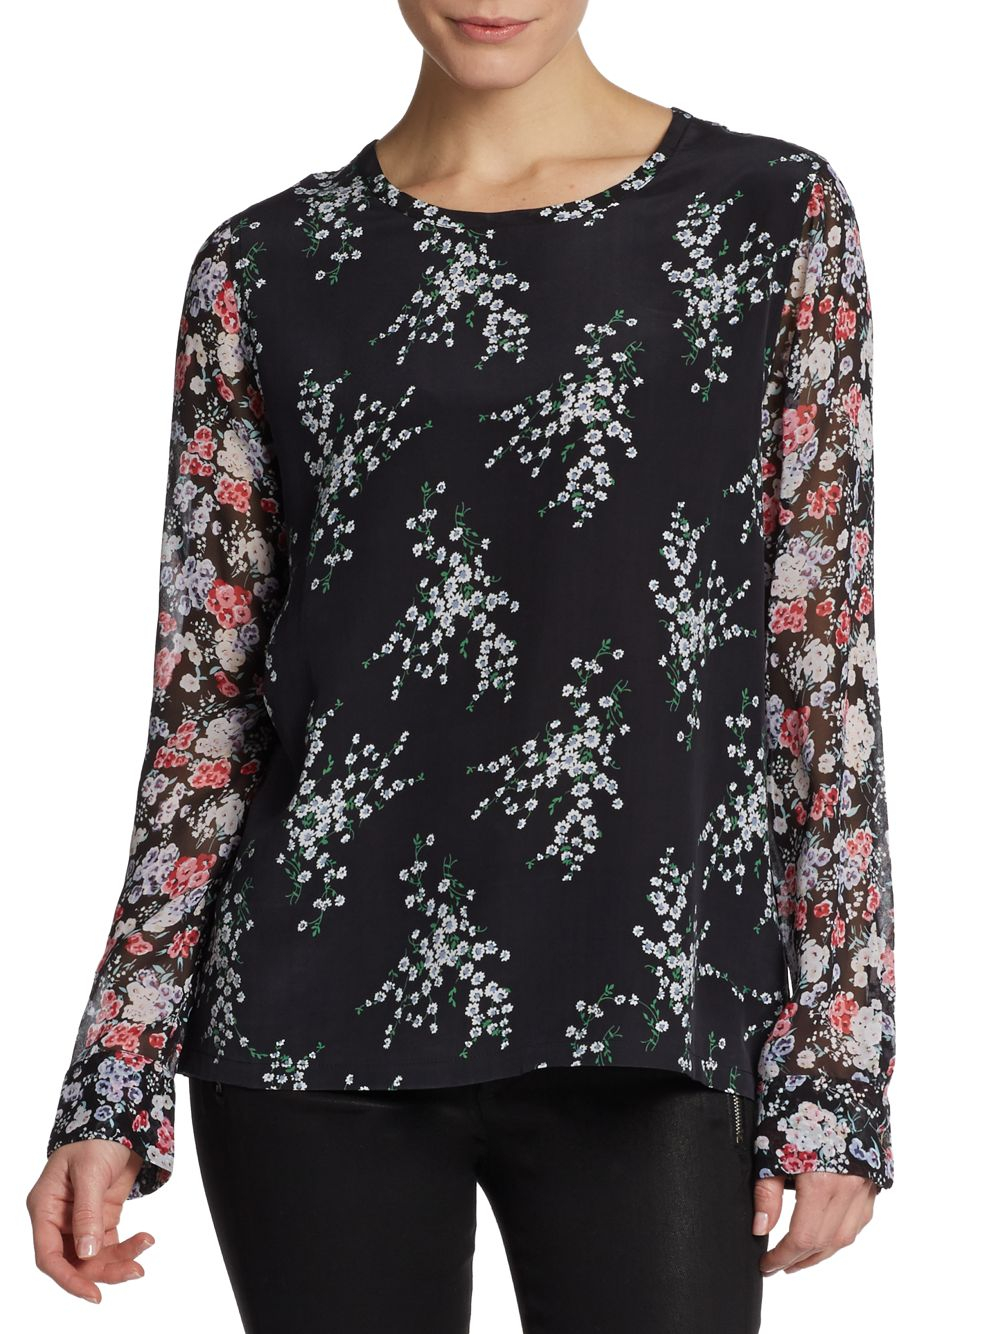 Lyst equipment liam floral print silk blouse in black for Equipment black silk shirt